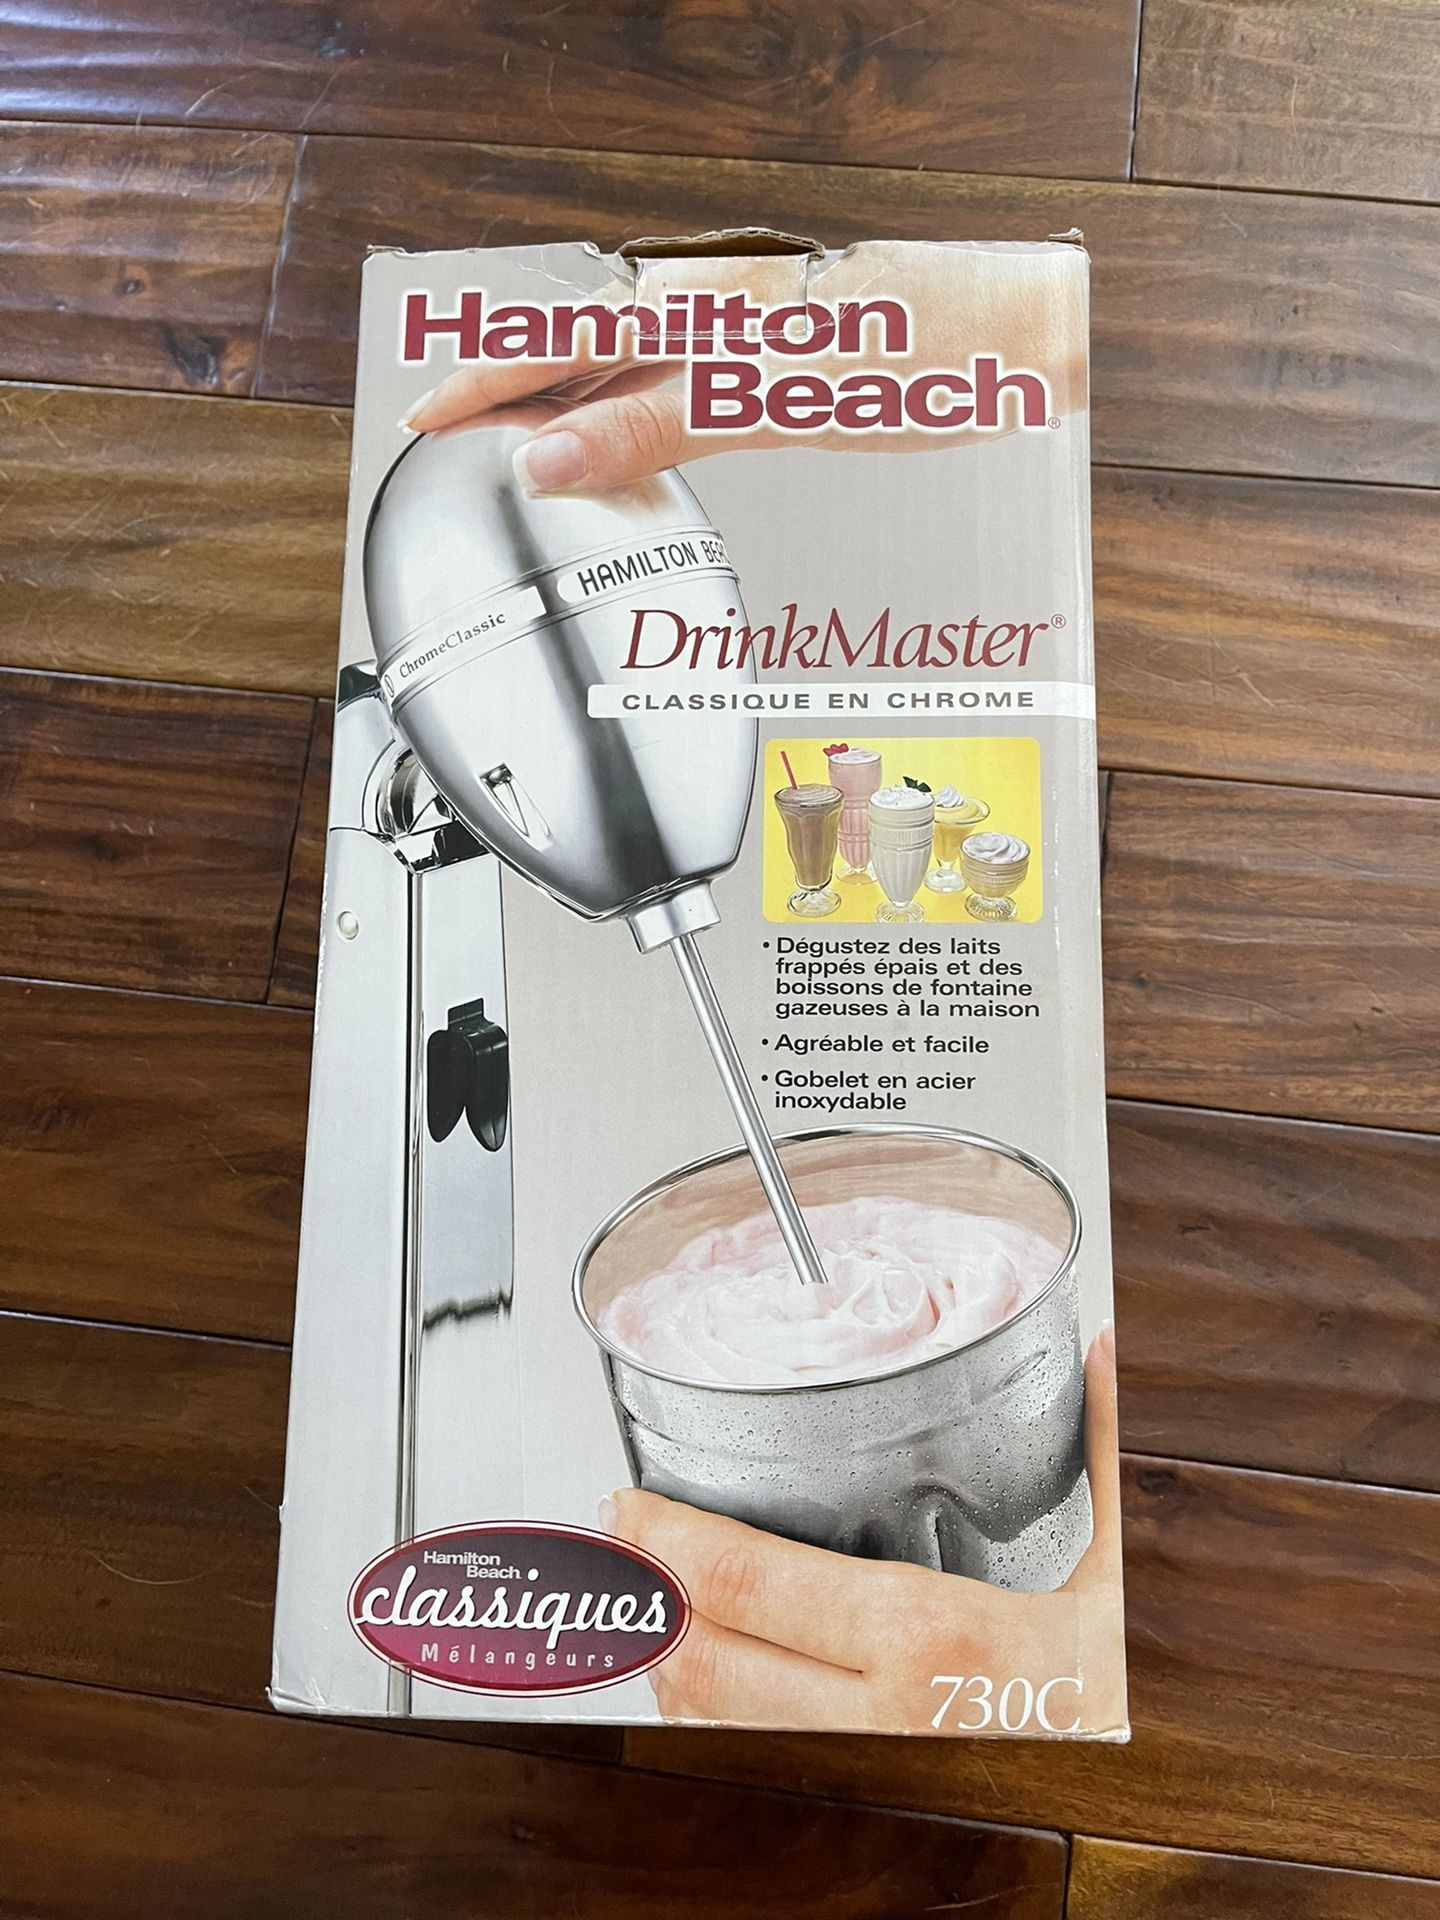 Hamilton Beach DrinkMaster